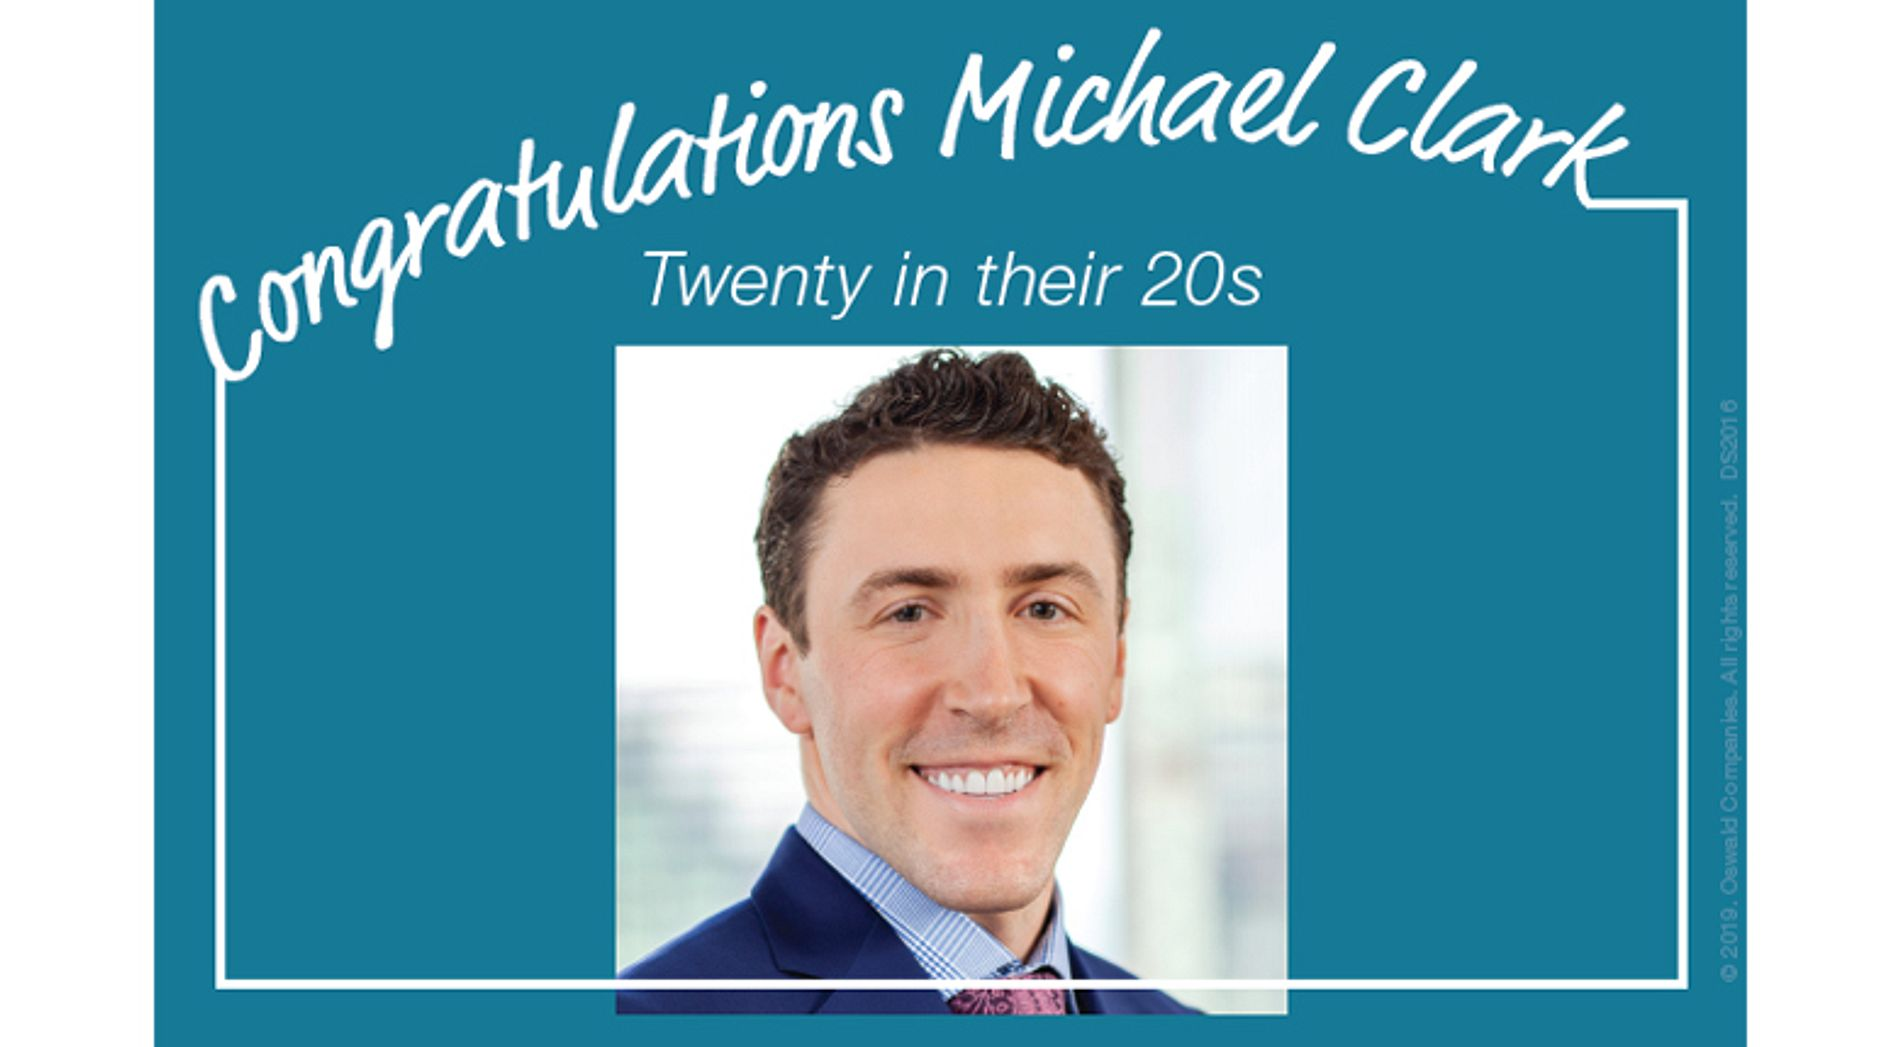 Michael Clark Oswald Cleveland Adviser, Twenty in their 20's